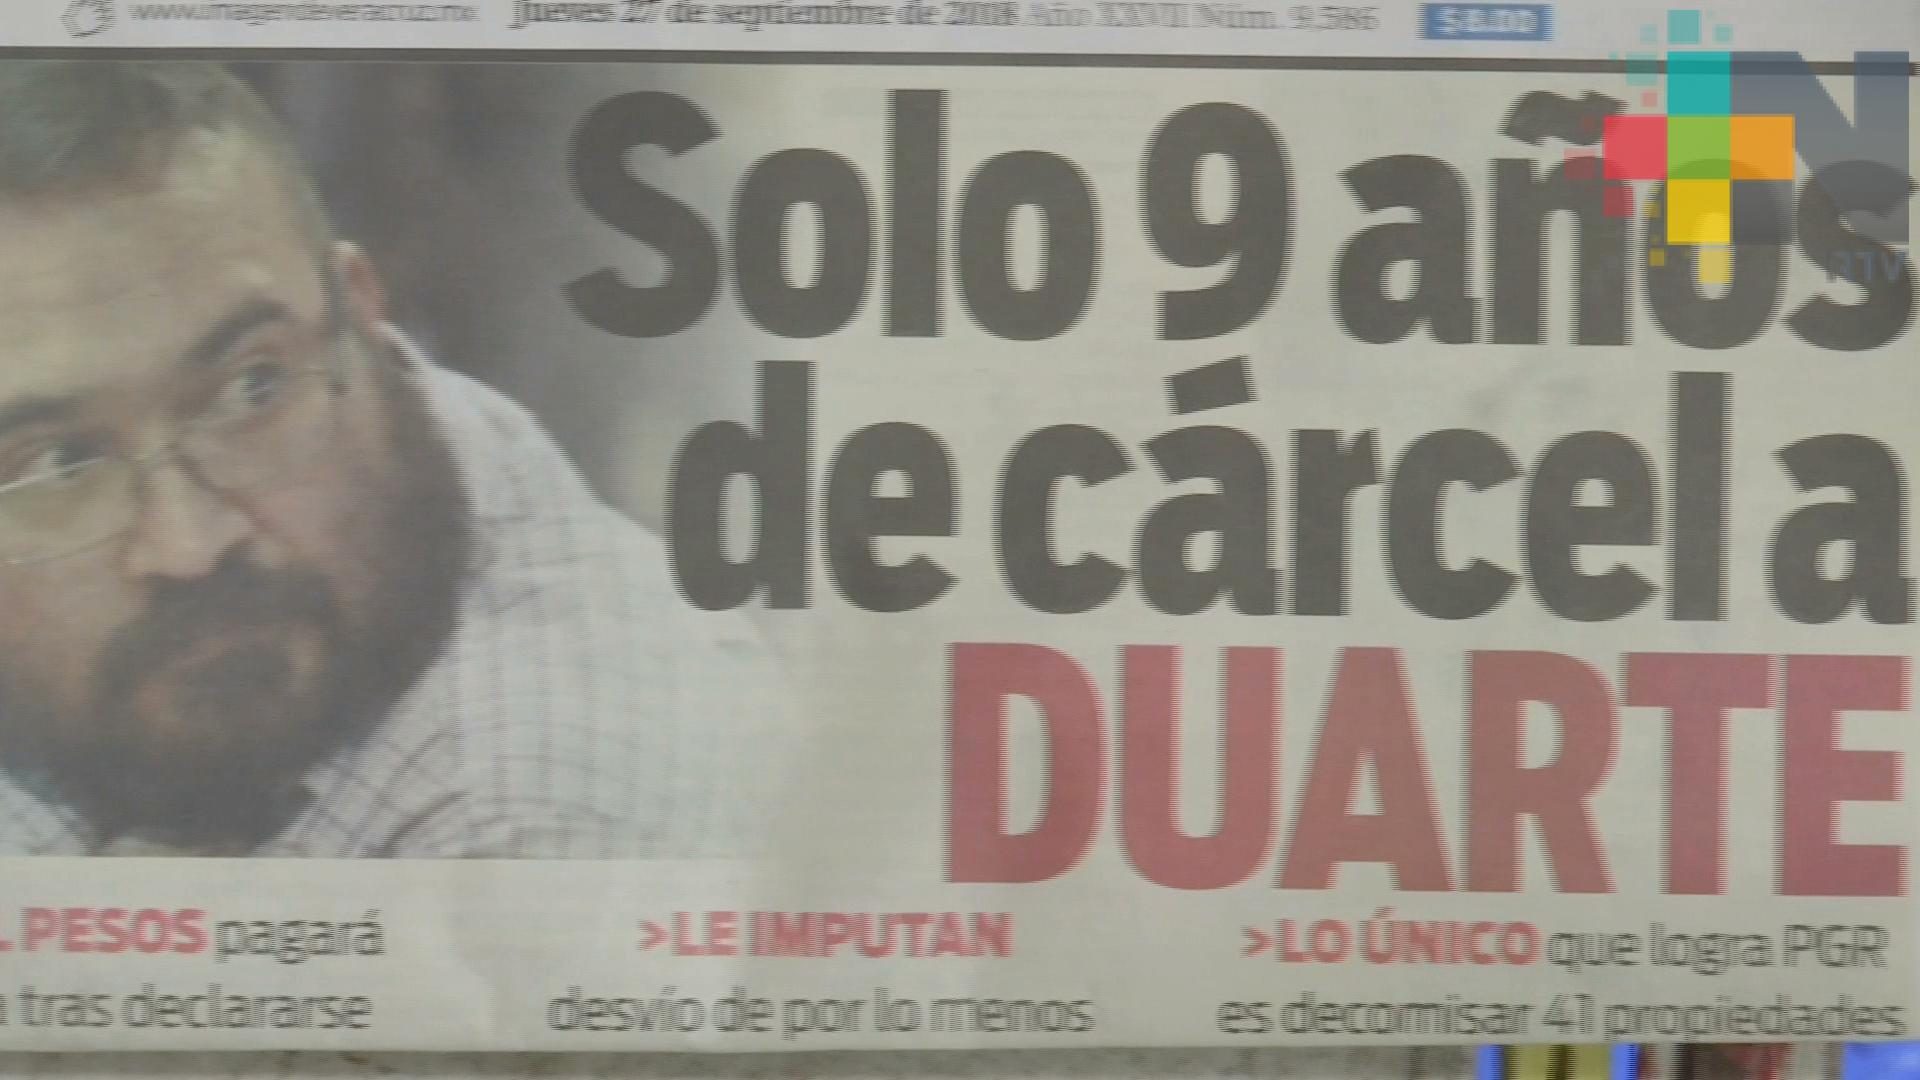 Inconforma a veracruzanos corta sentencia contra Duarte